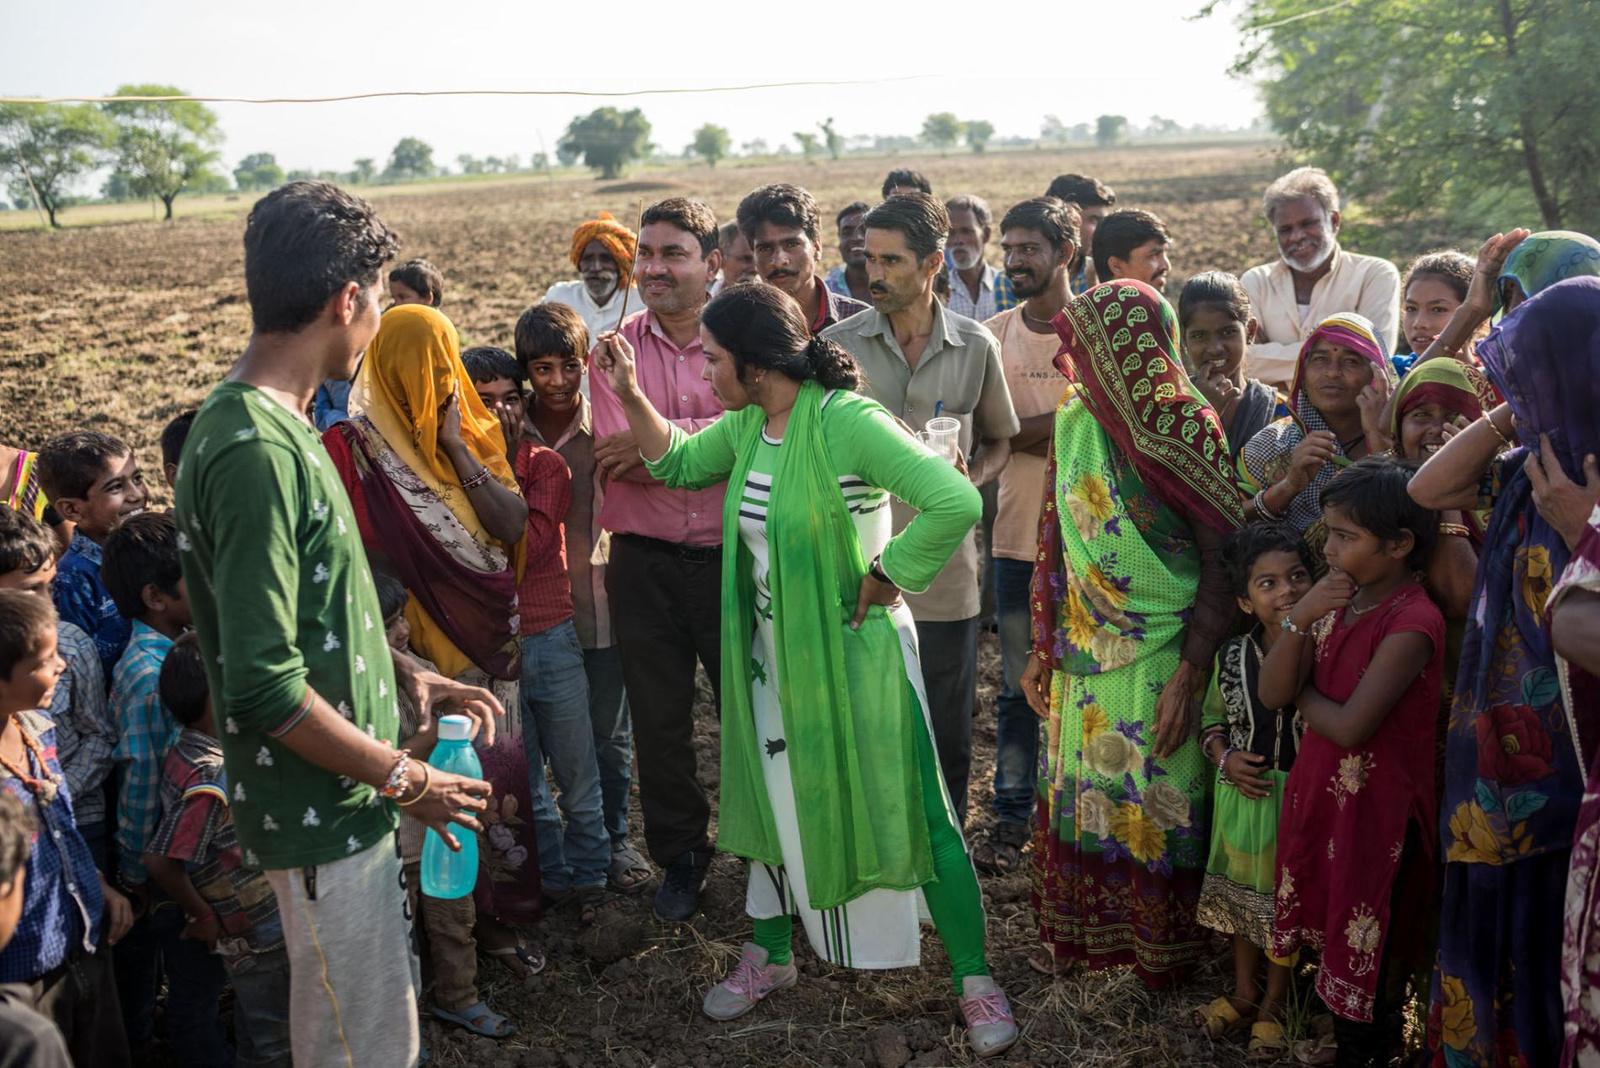 sanitation-india-group-field.adapt.1900.1